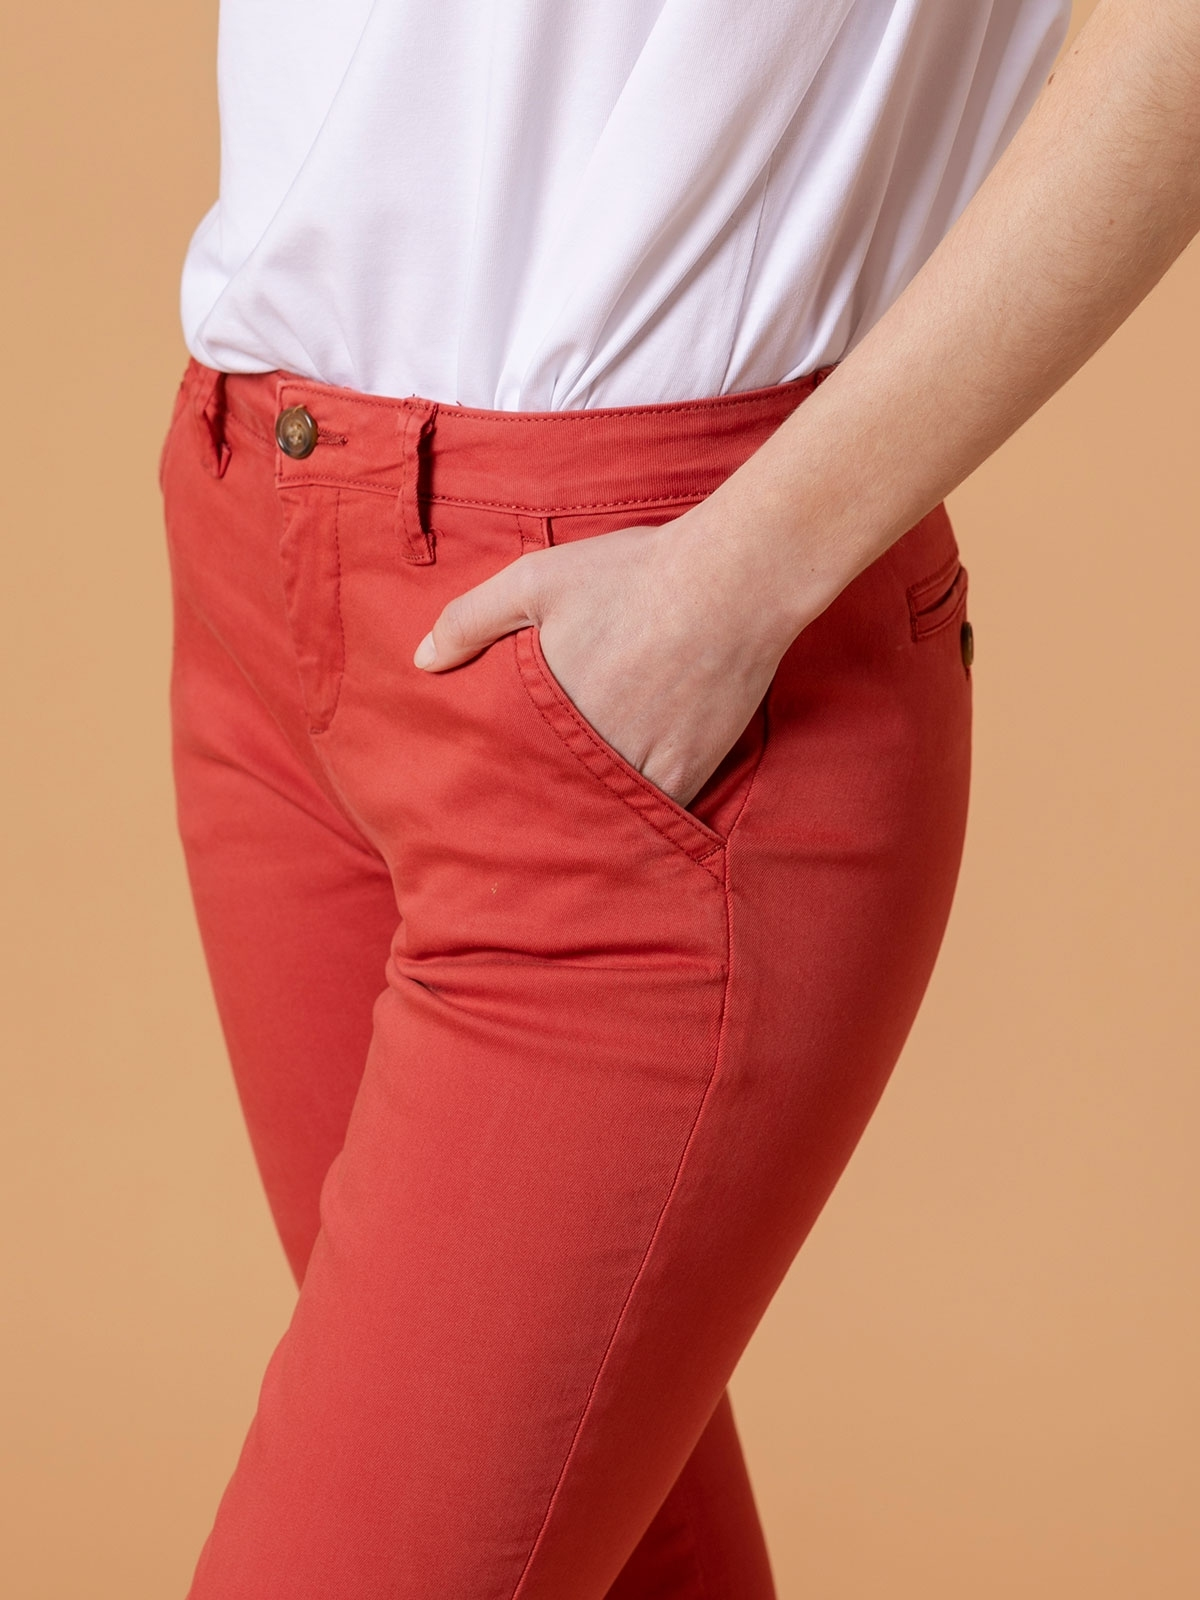 Pantalón chino mujer algodón elastico Teja